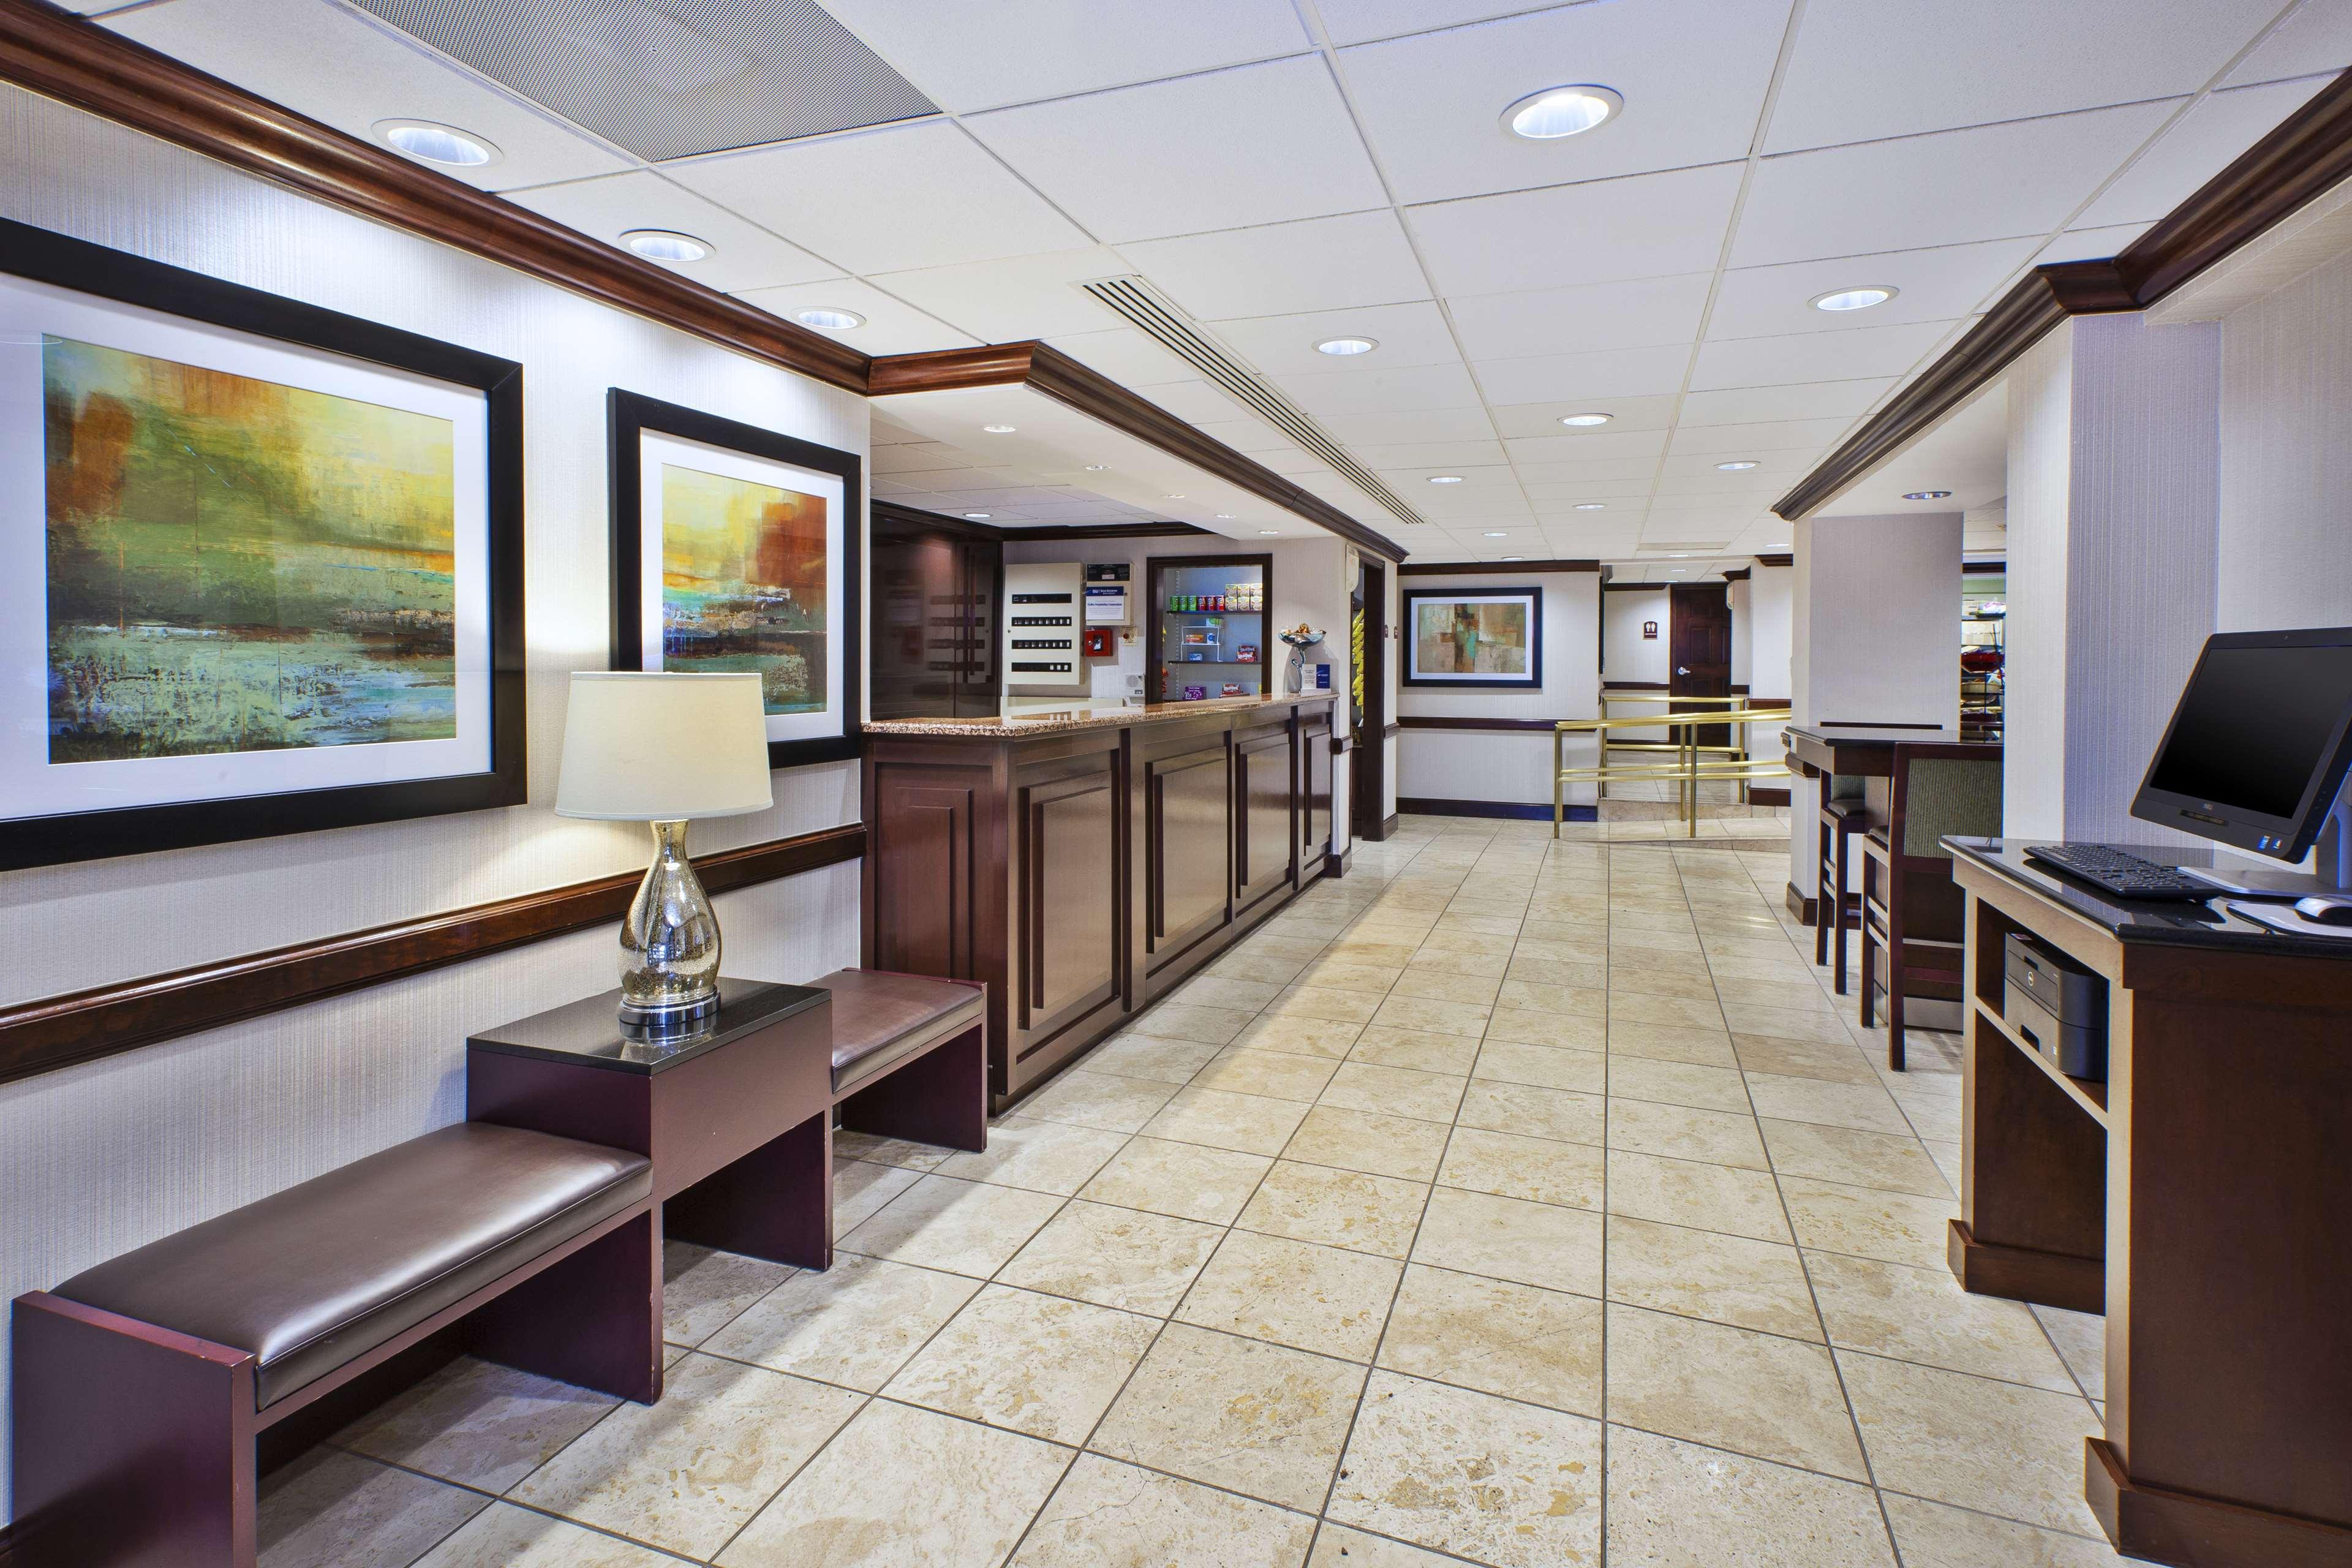 Best Western Dulles Airport Inn image 1